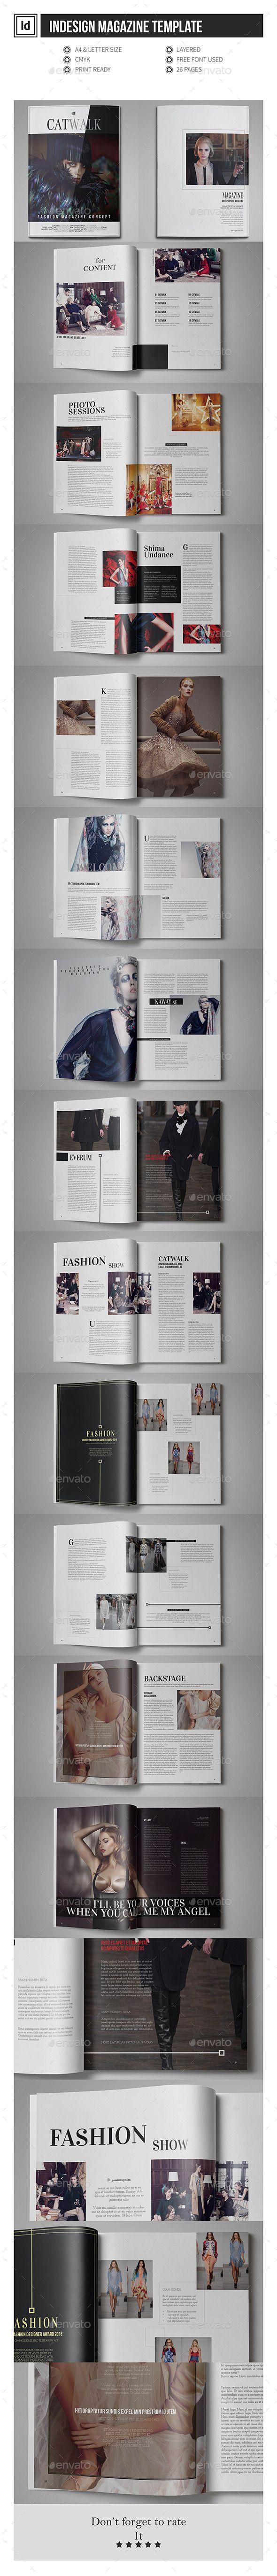 Multipurpose Magazine Template #design Download: http://graphicriver.net/item/multipurpose-magazine-template/11904443?ref=ksioks